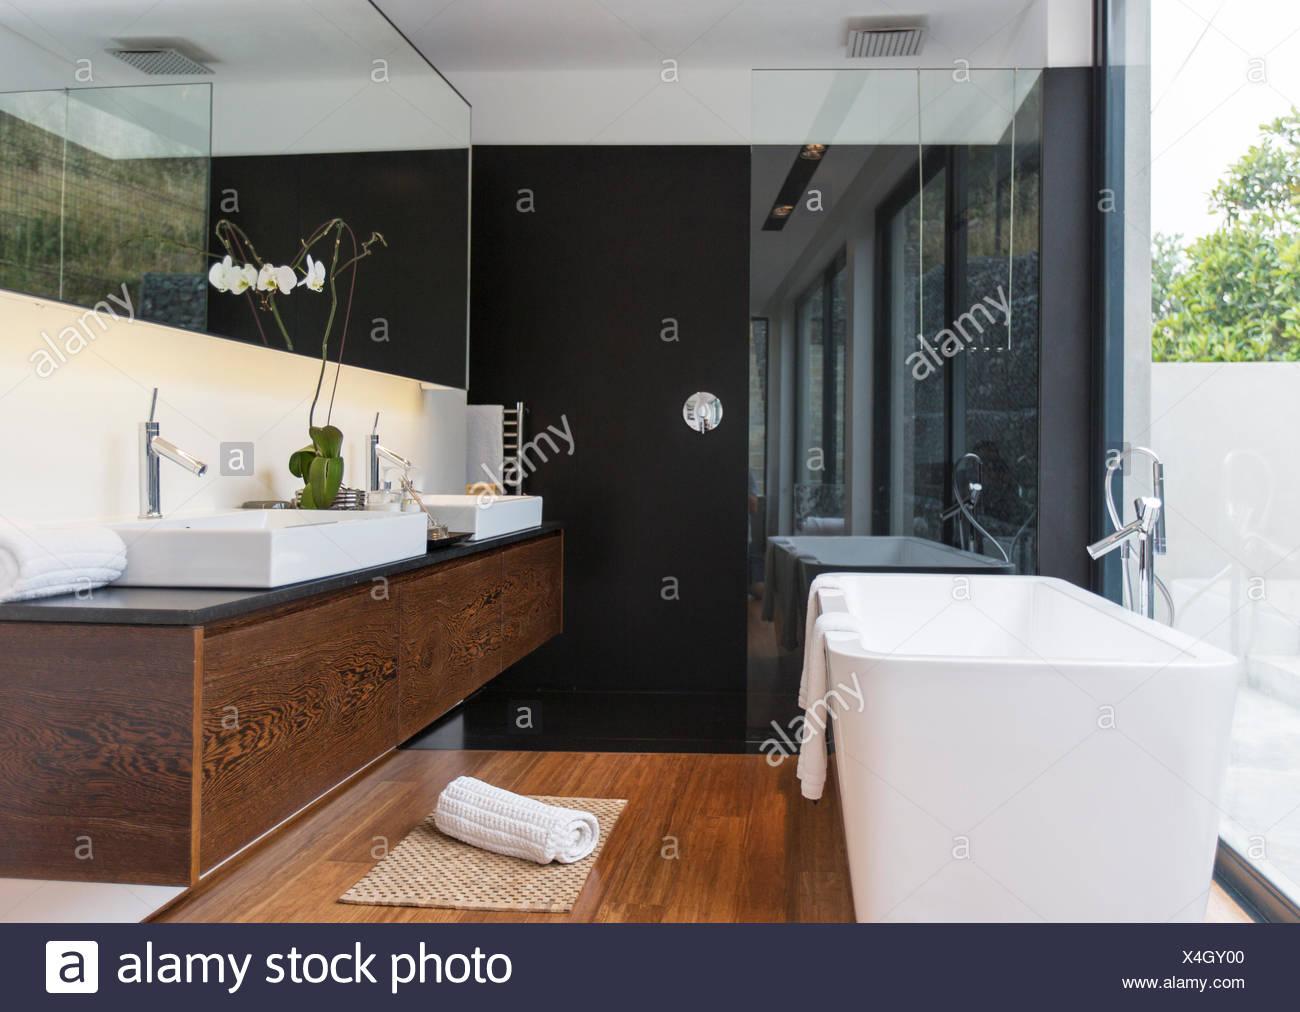 Bathtub and sinks in modern bathroom - Stock Image